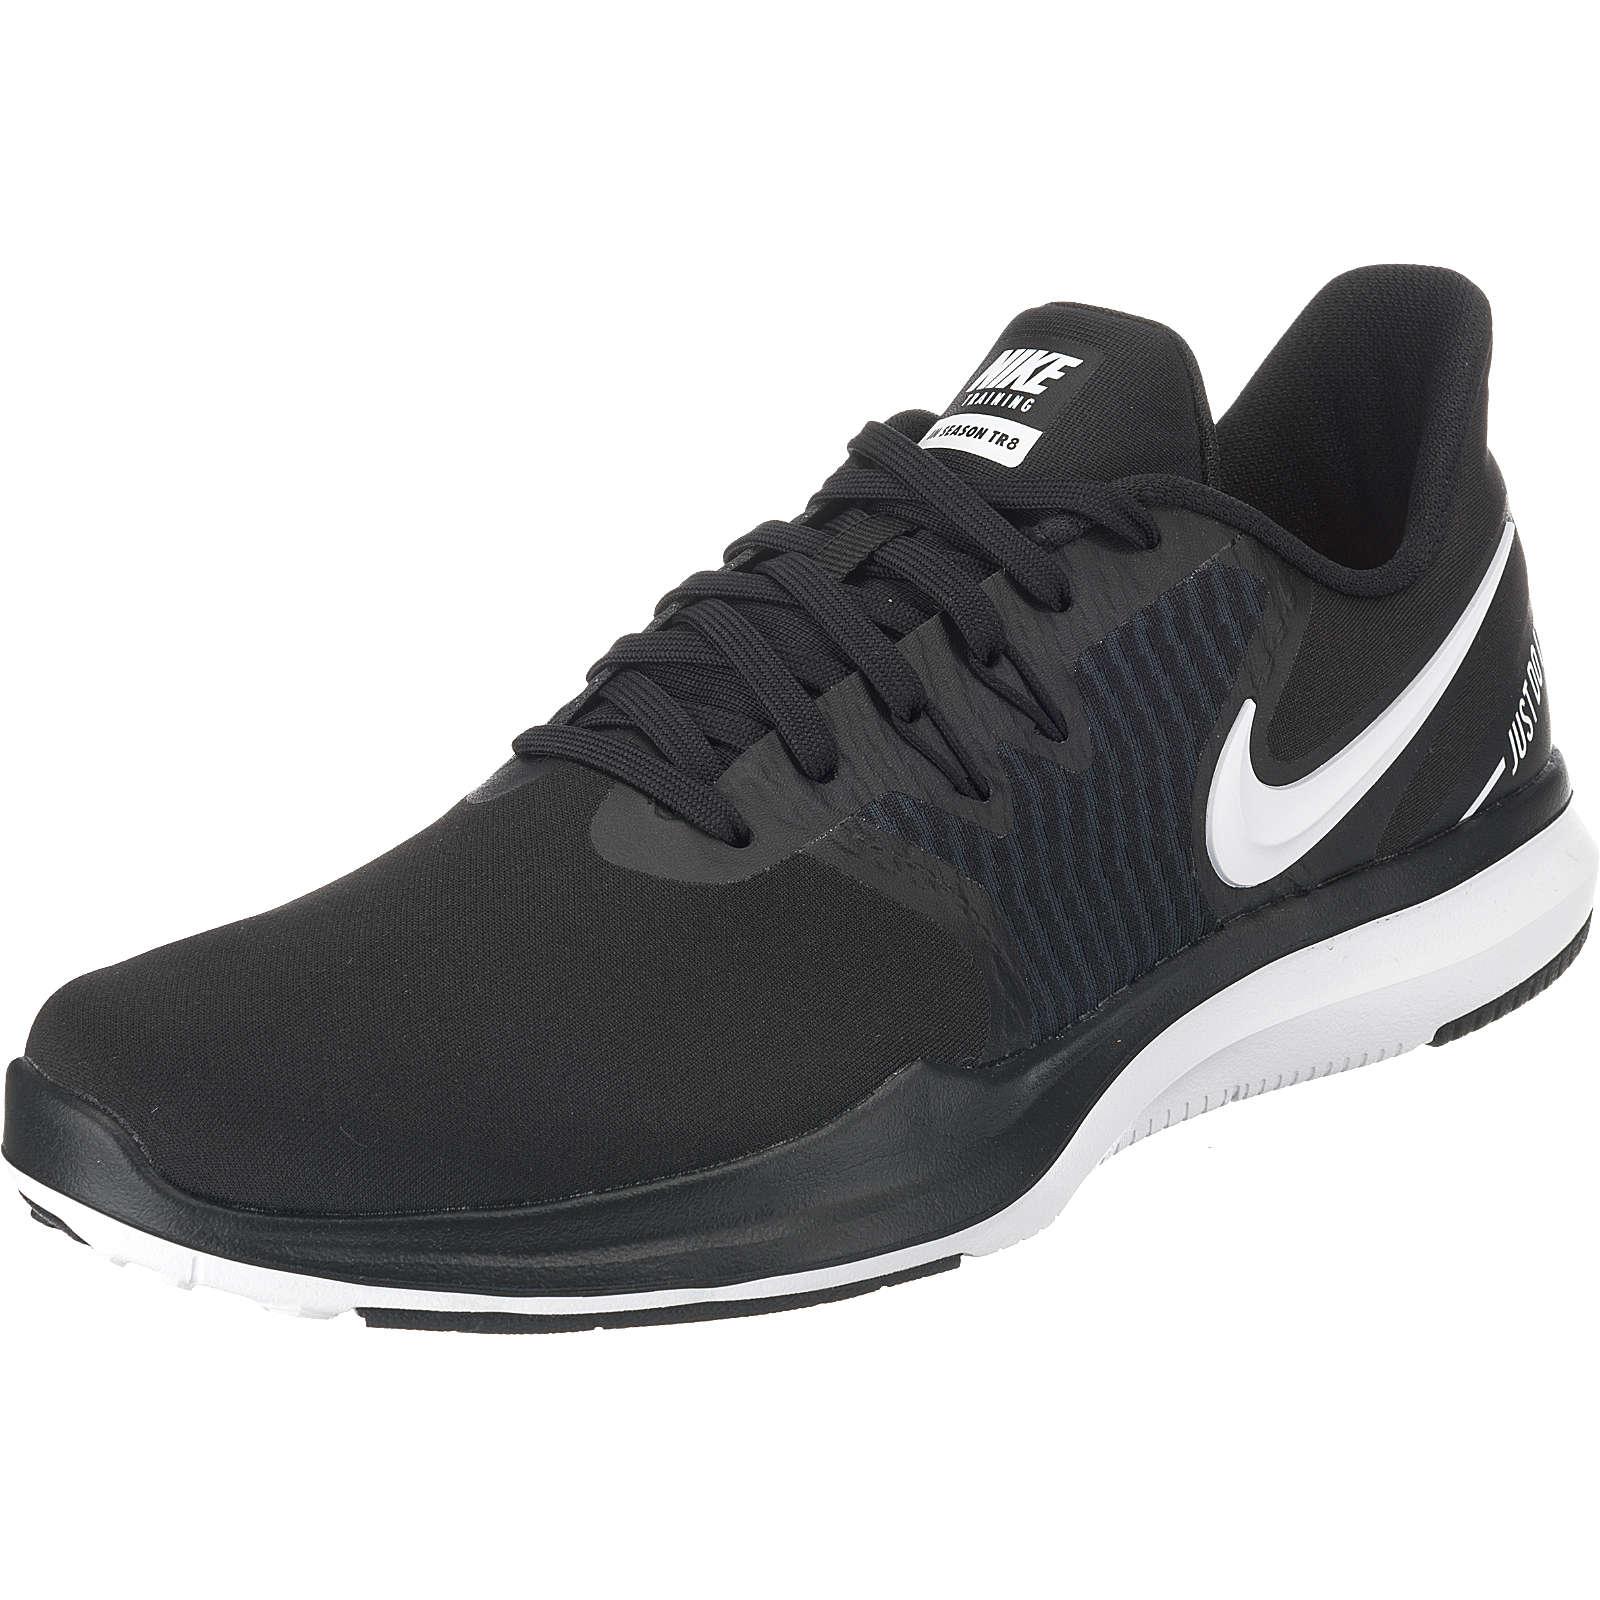 Nike Performance Tr 8 Fitnessschuhe schwarz Damen Gr. 38